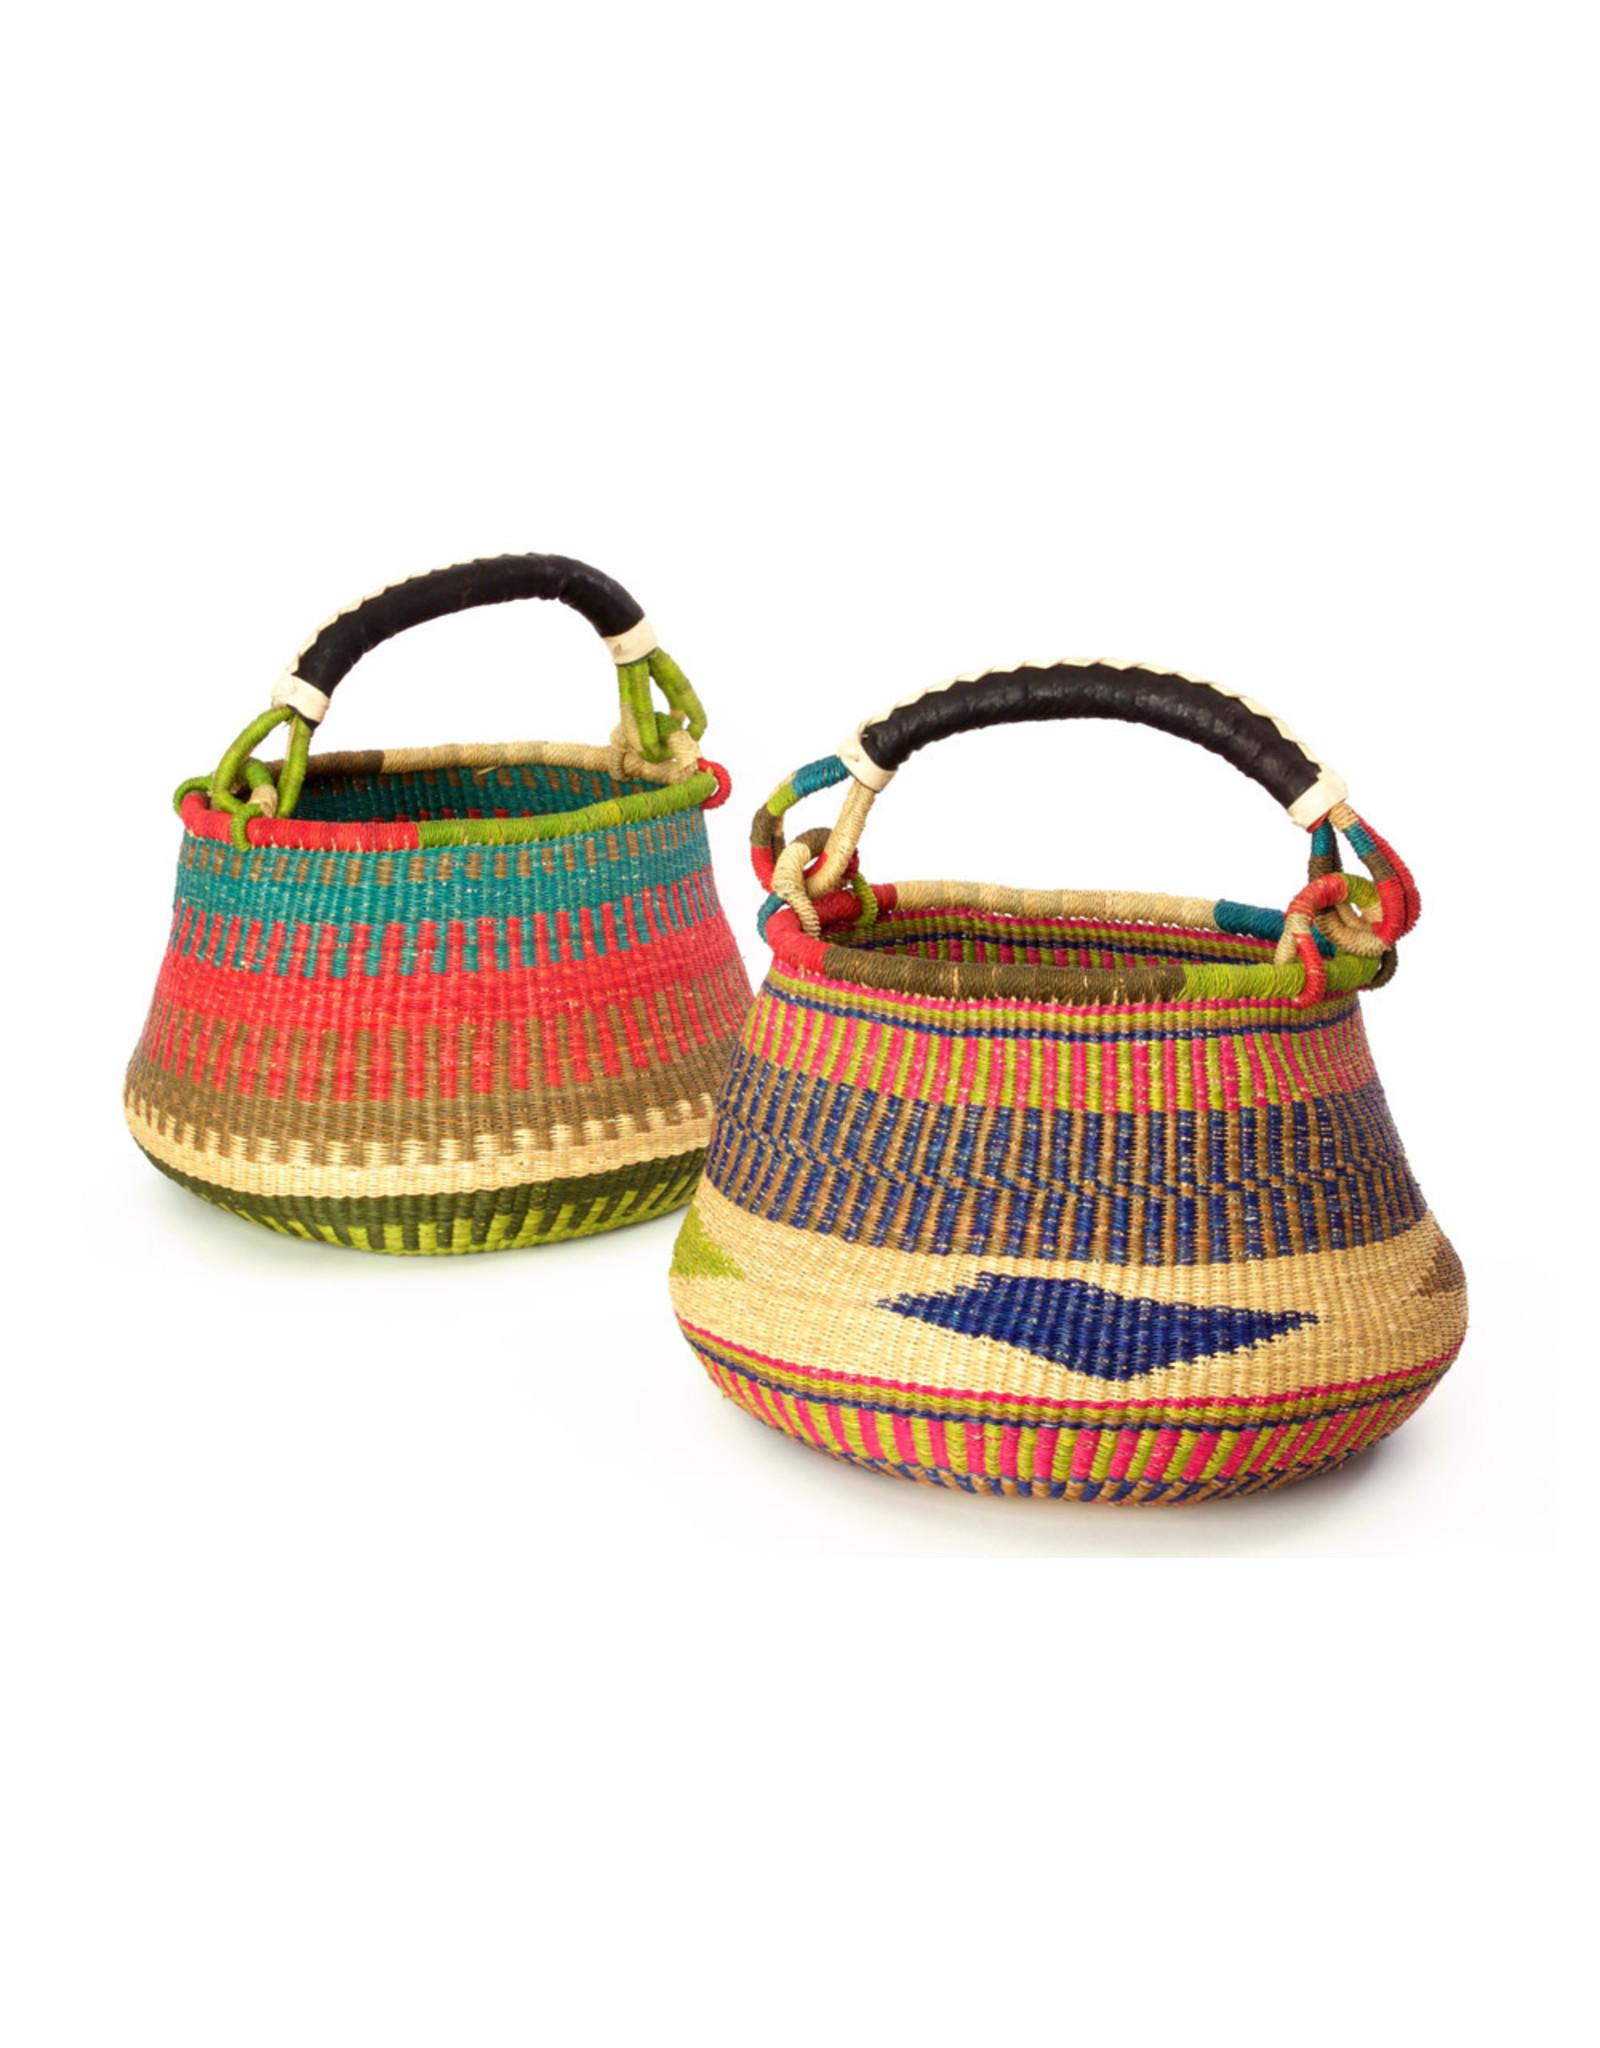 Swahili Wholesale Pear Bottom Bolga Basket, assorted. Ghana